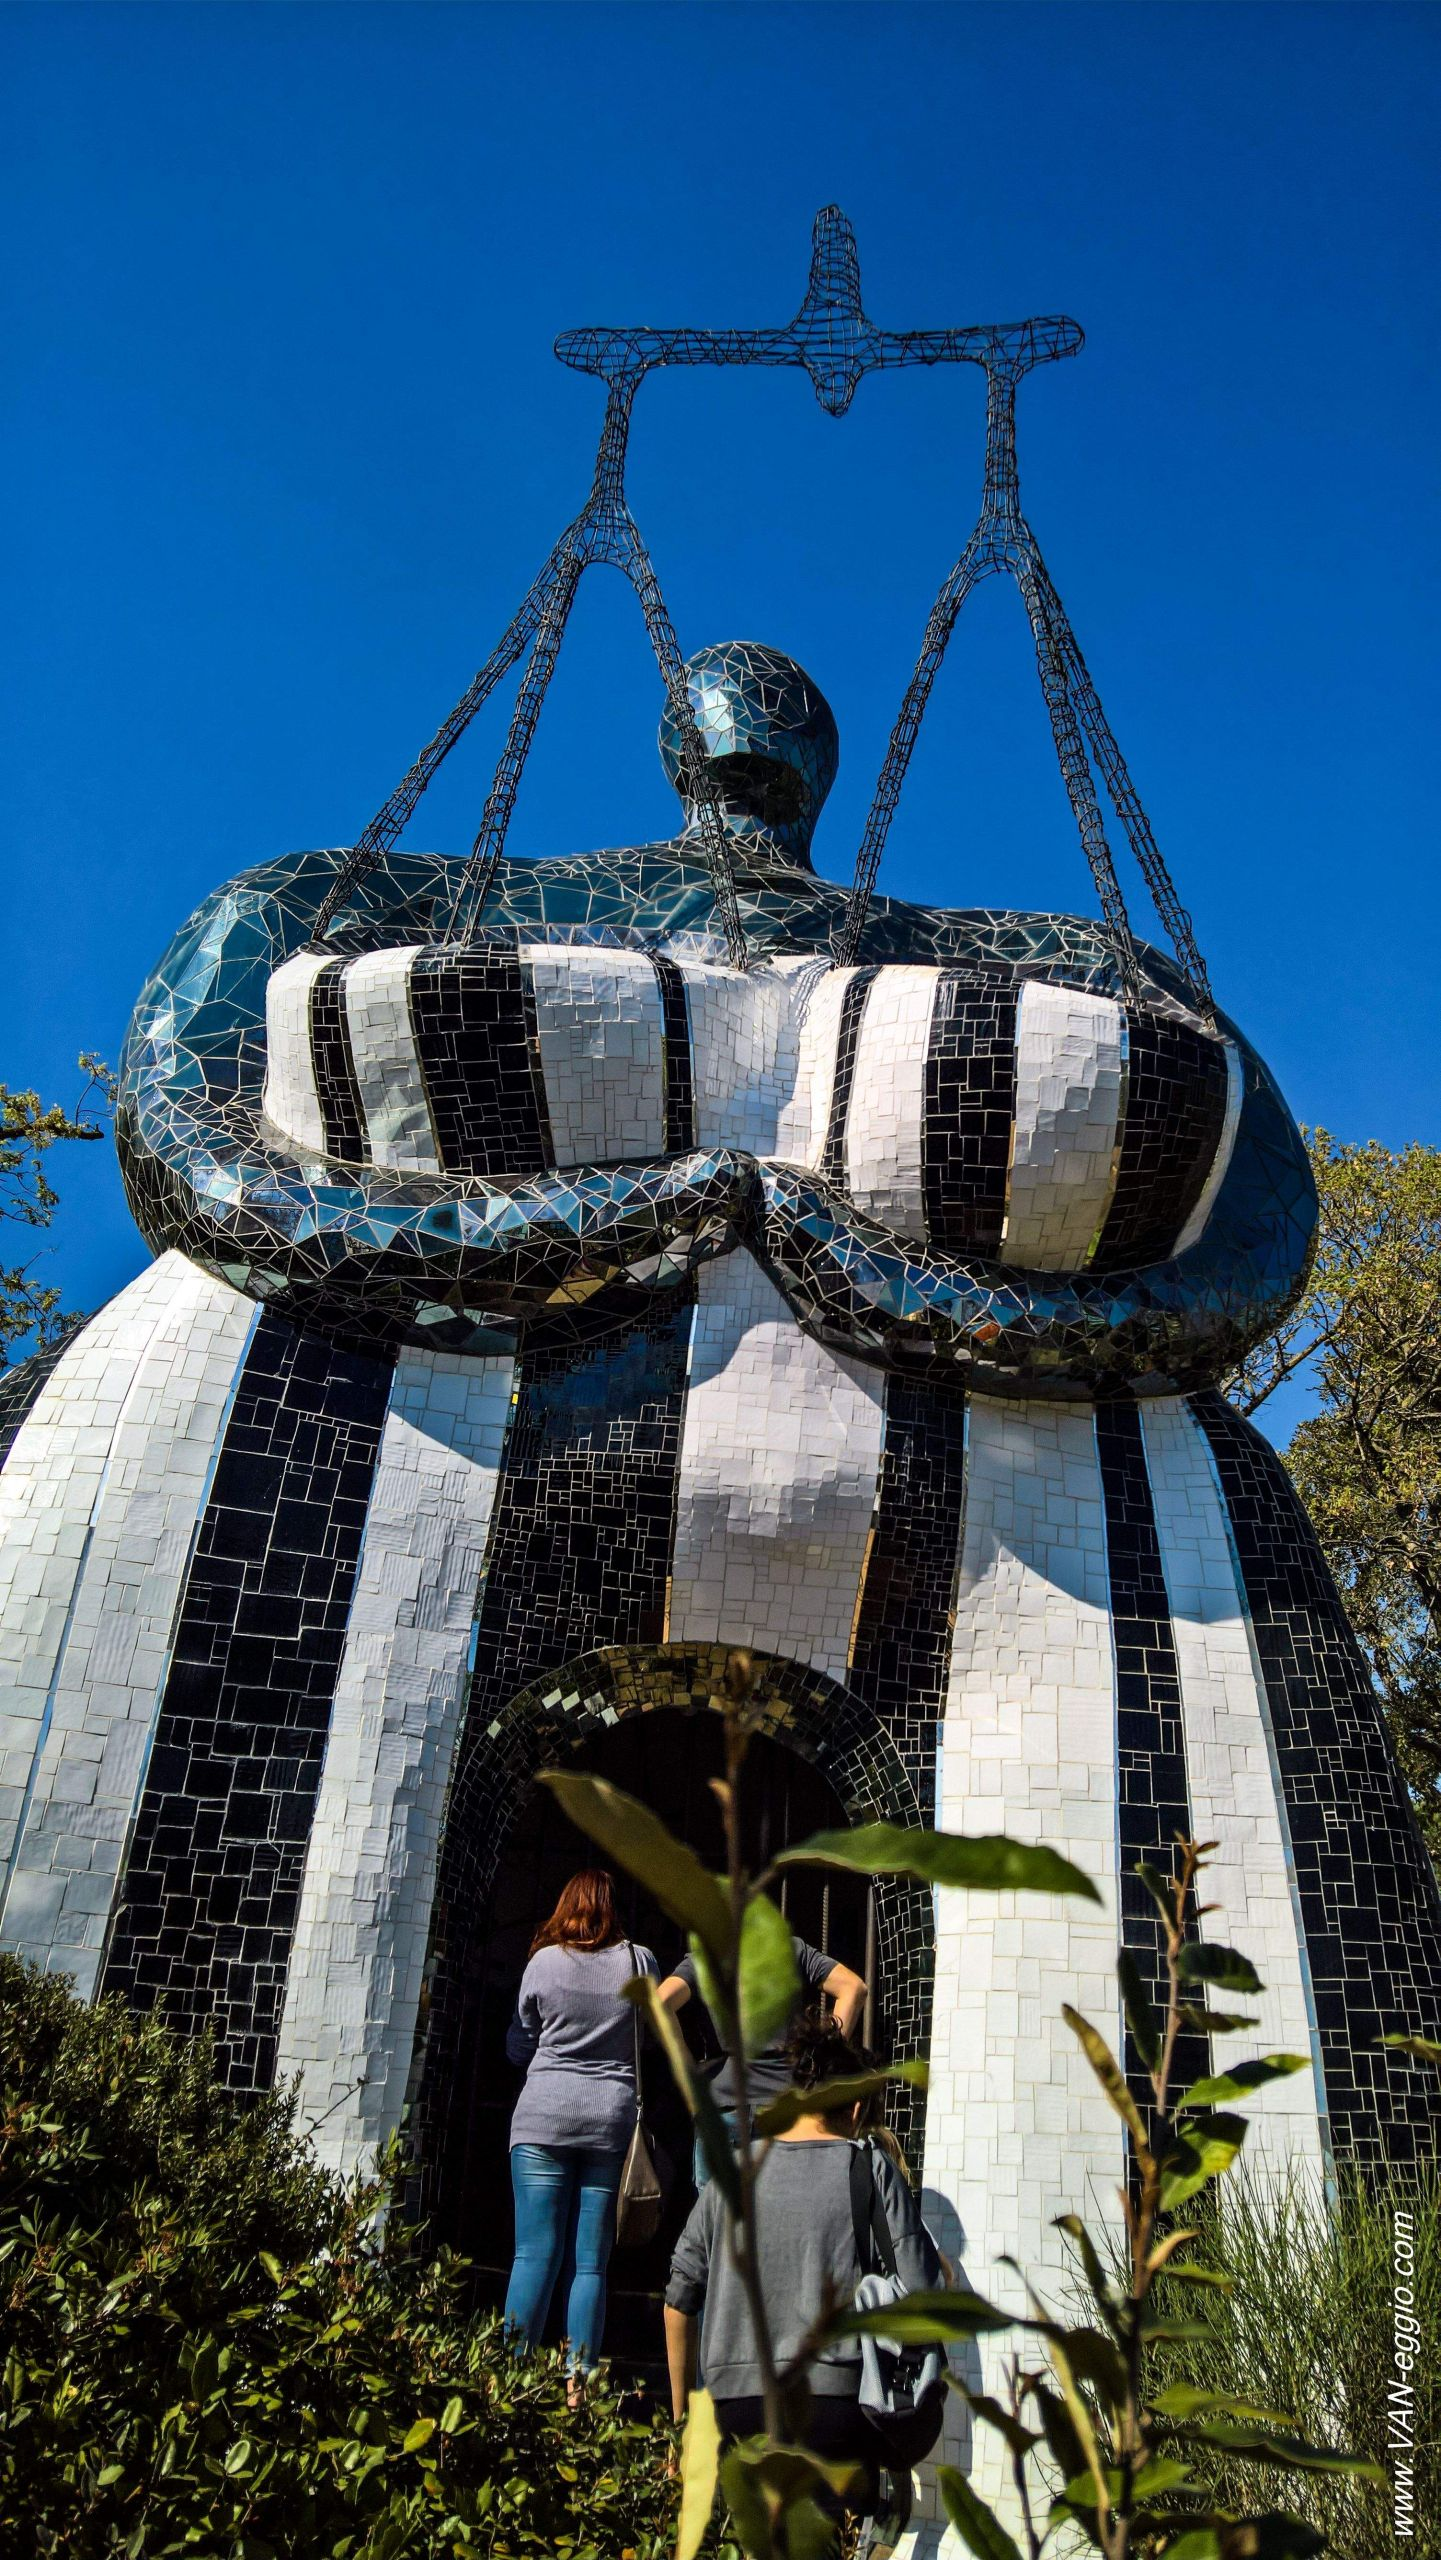 Tarot Garten toskana Neu Pin Von Pine & Max Fivi Auf Arte Tiles & Mosaik